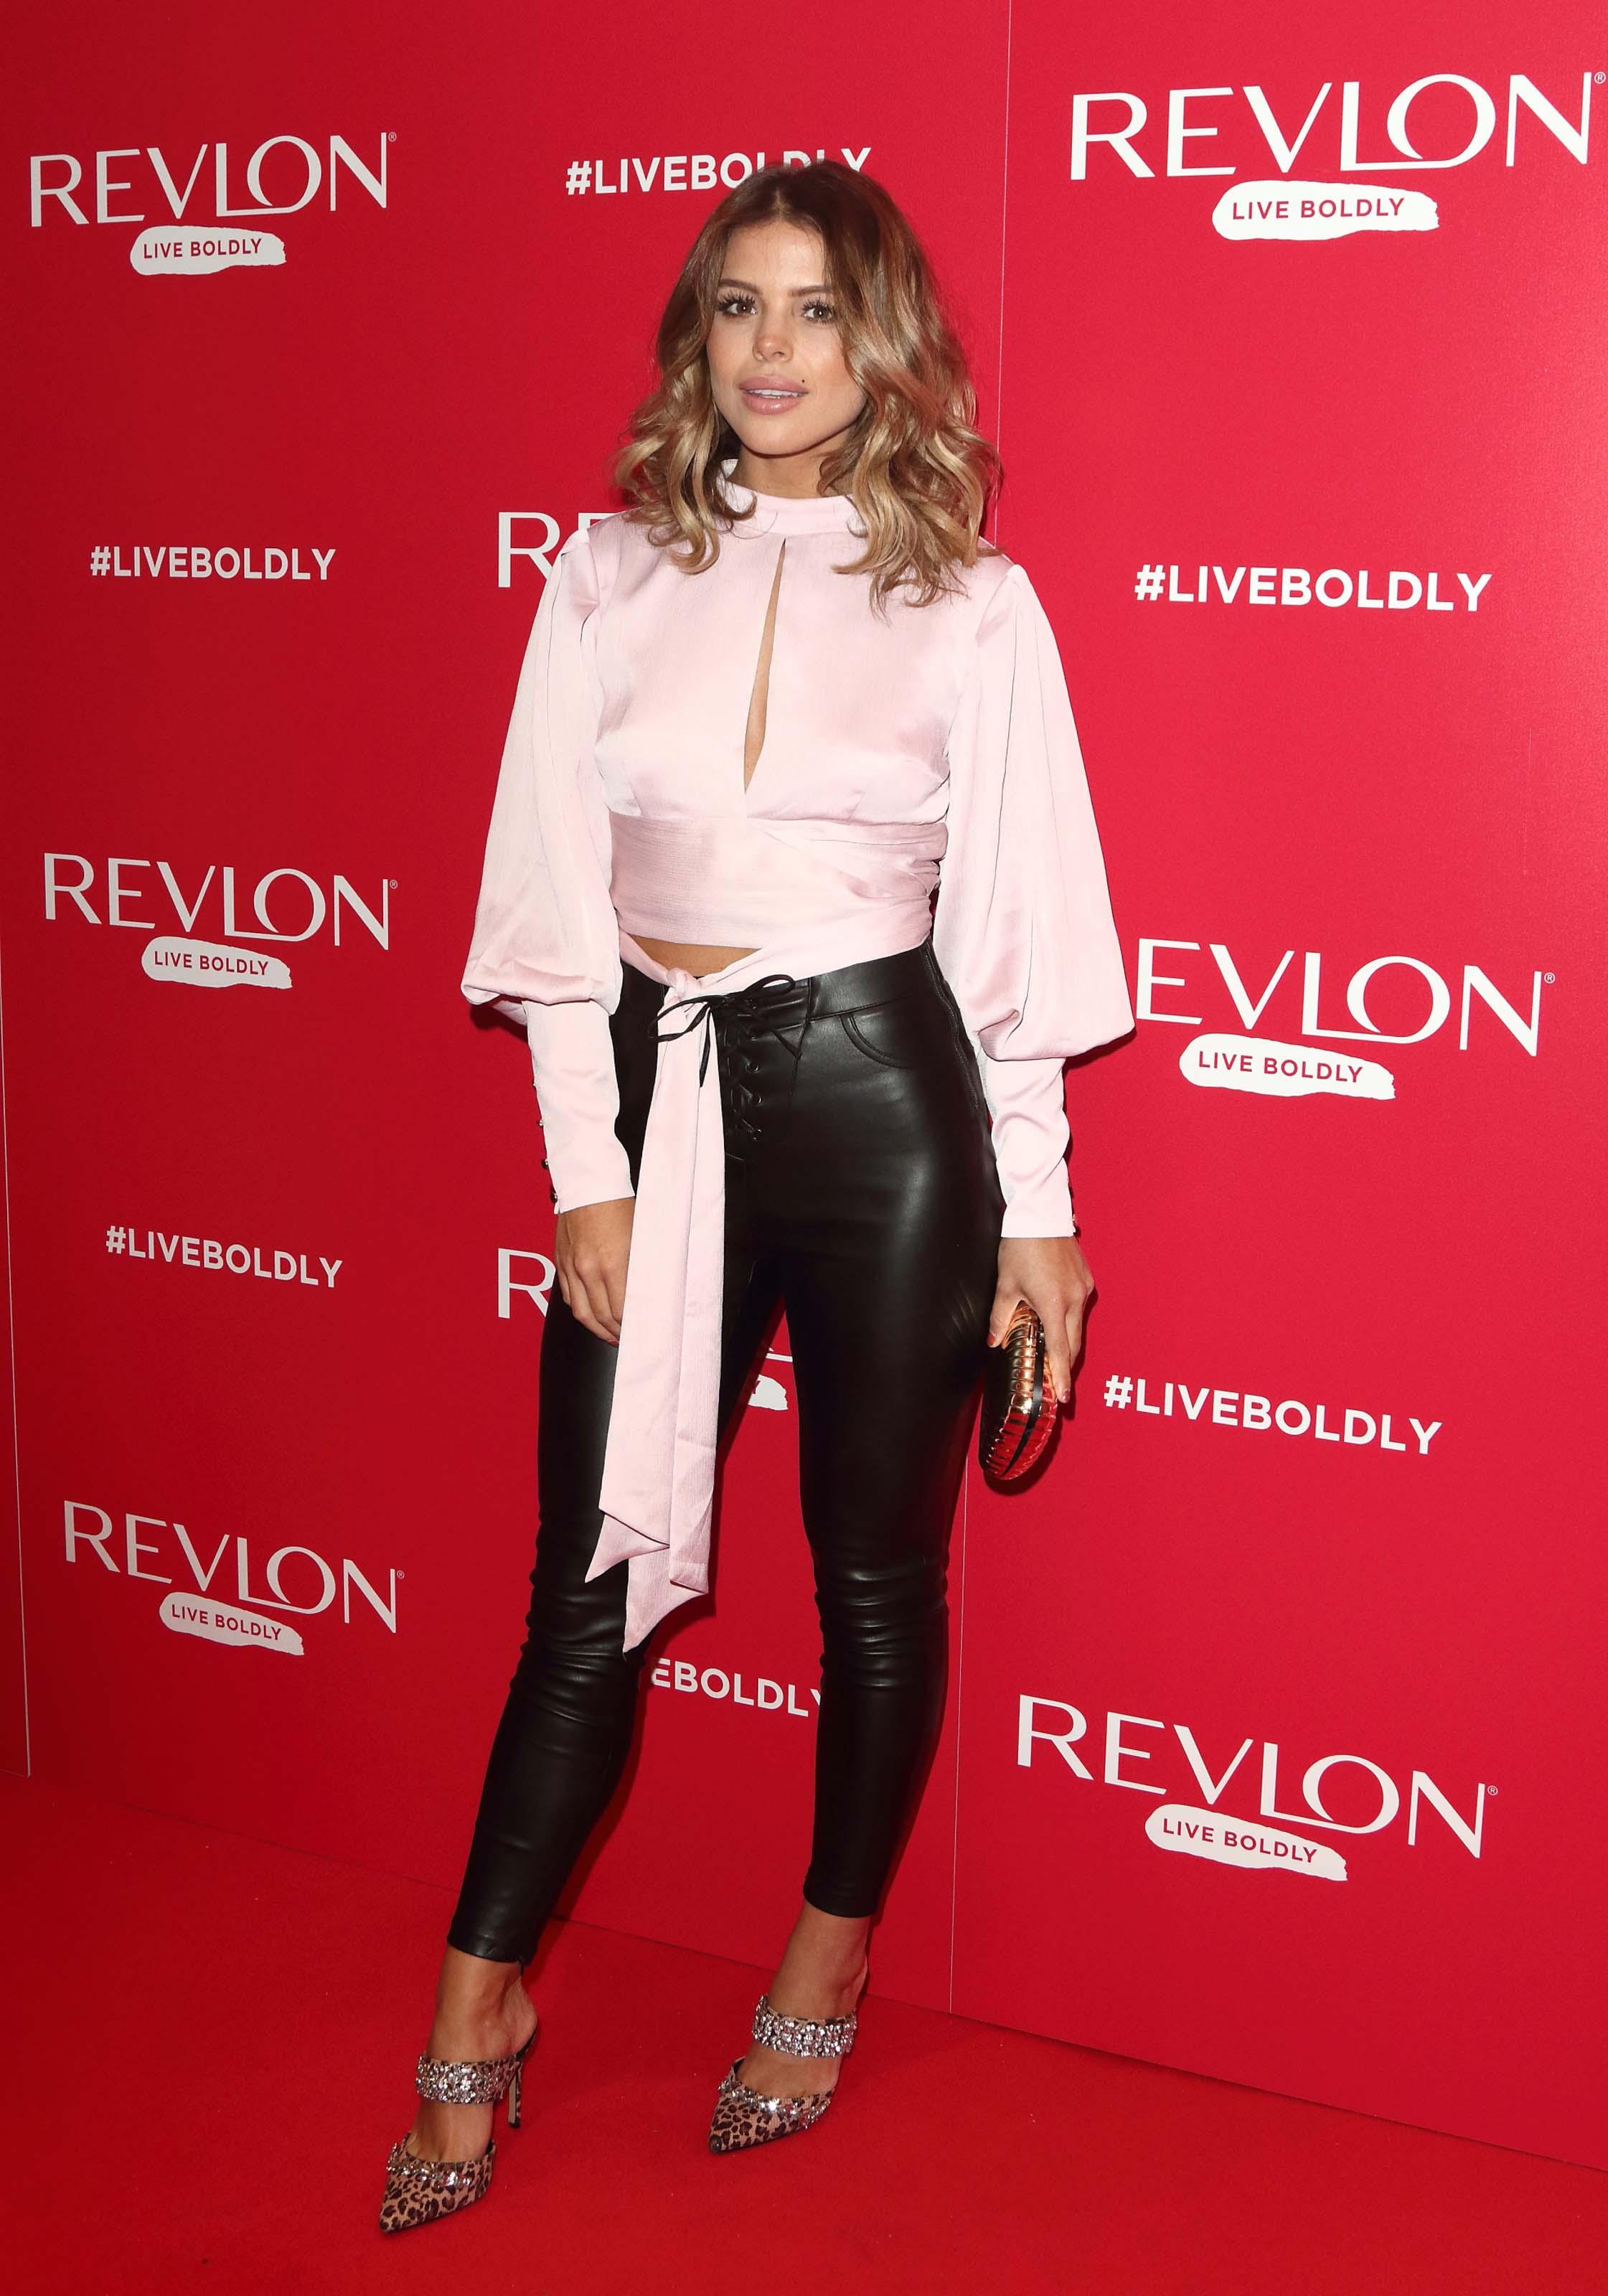 Chloe Lewis attends Adwoa Aboah x Revlon Live Boldly Party